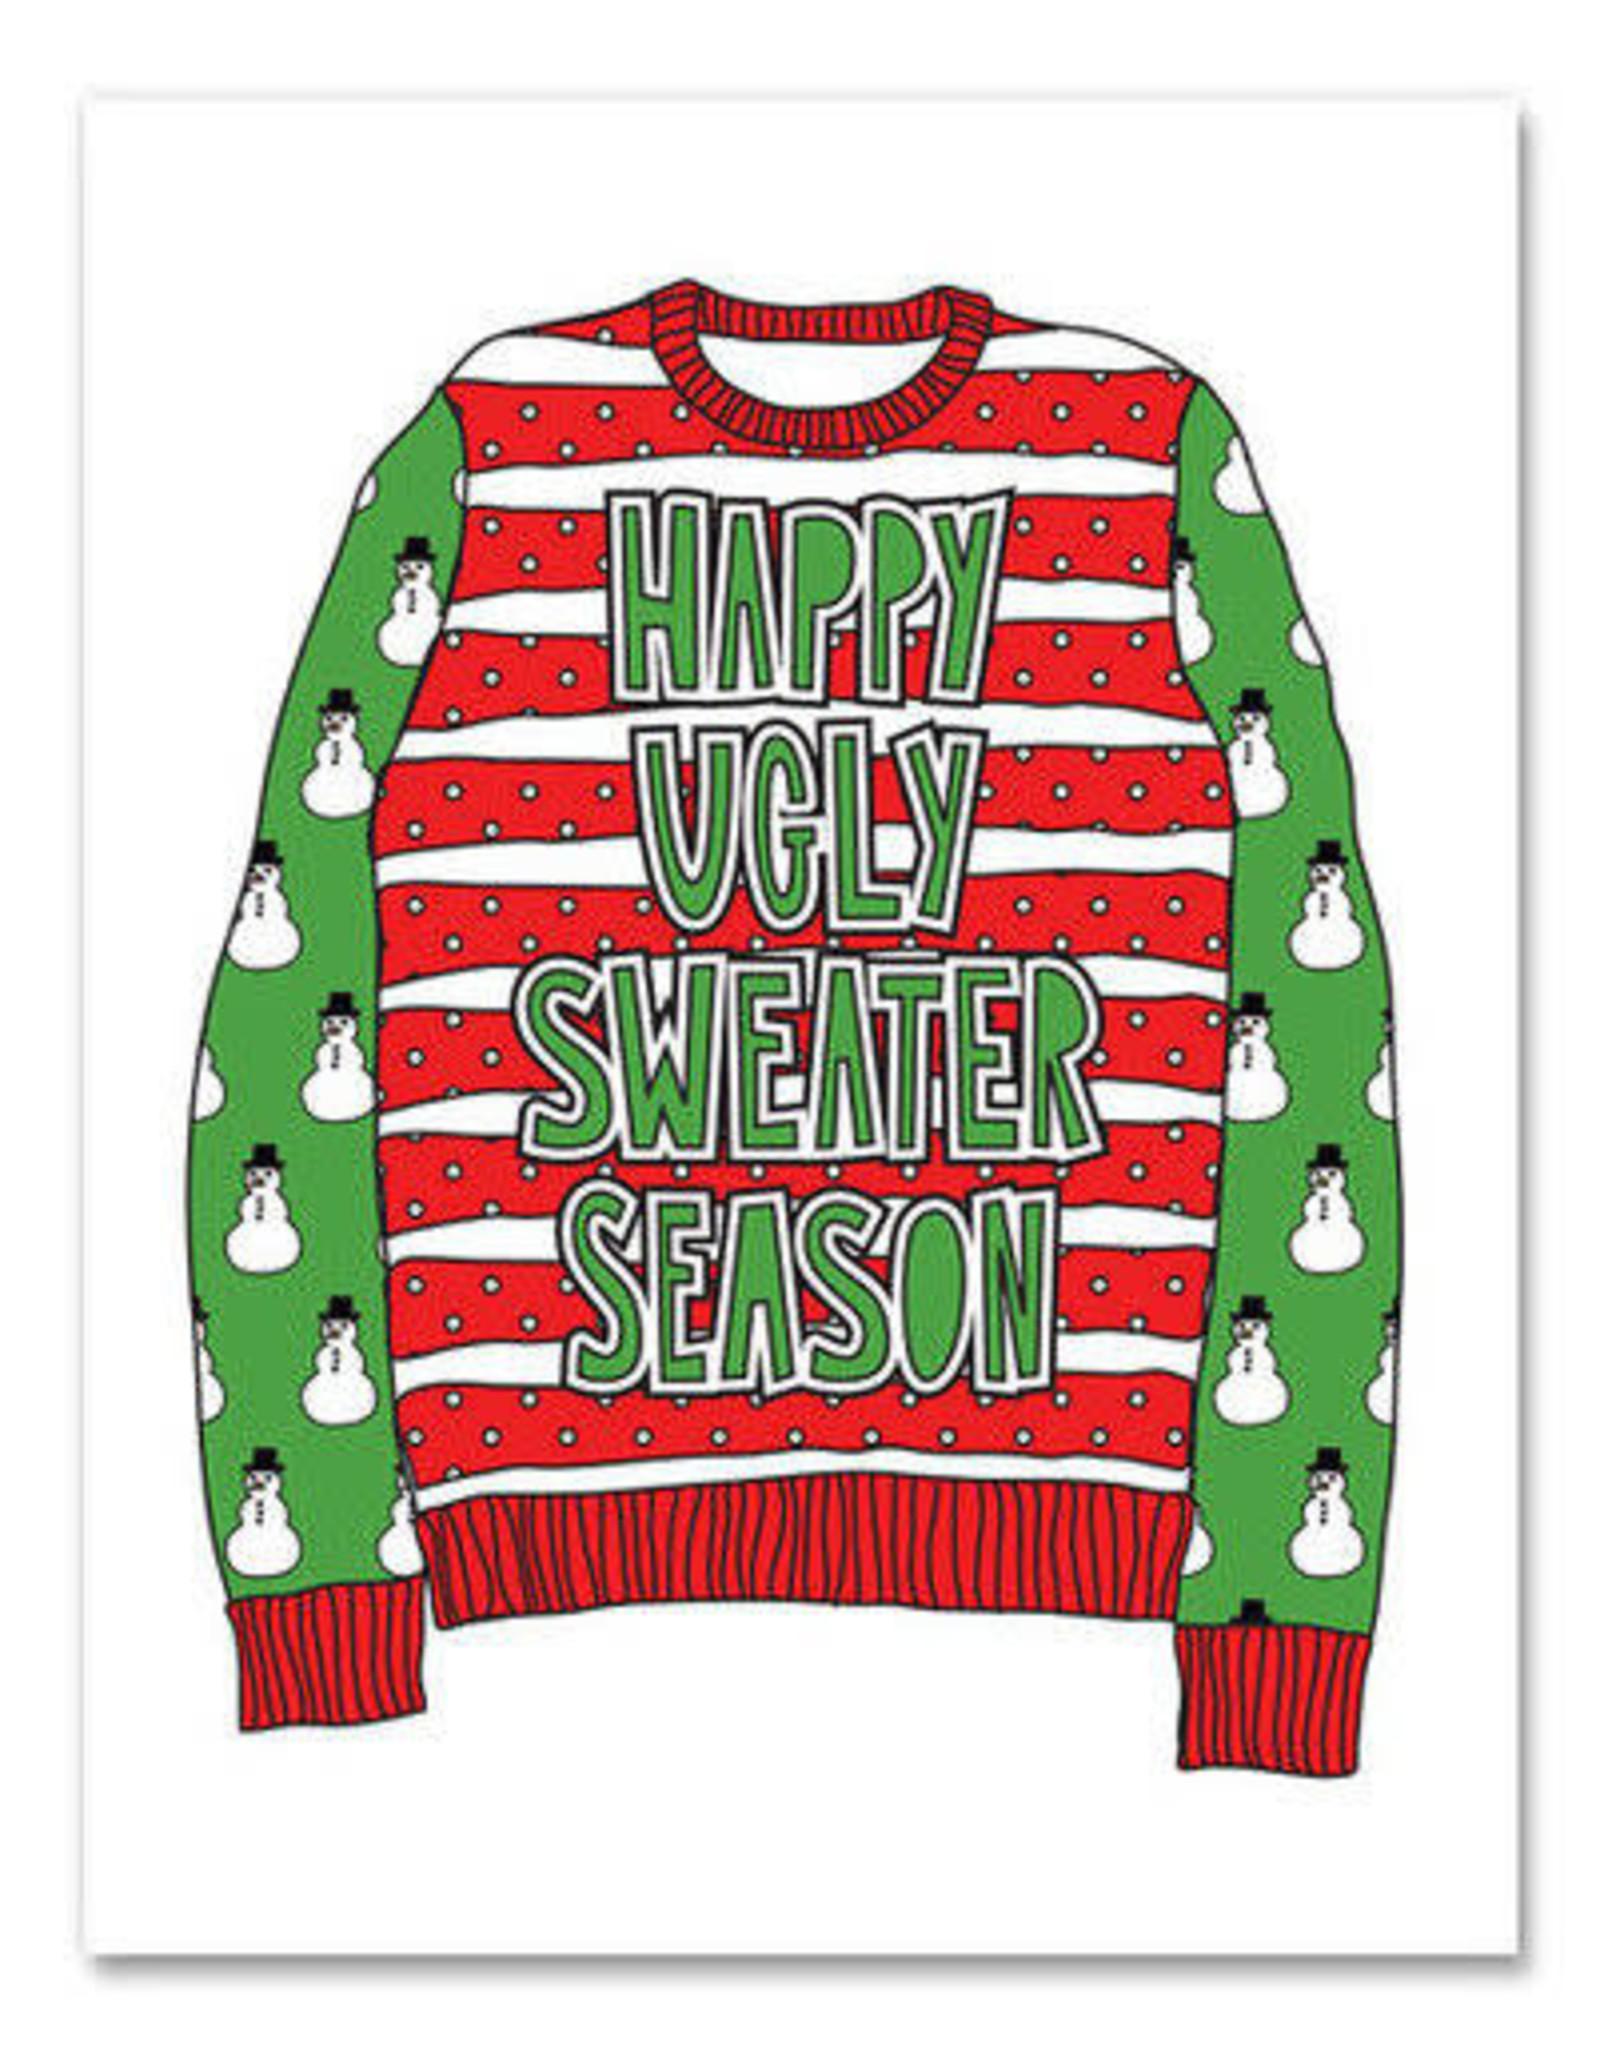 """Happy Ugly Sweater Season"" Holiday Greeting Card - Near Modern Disaster"